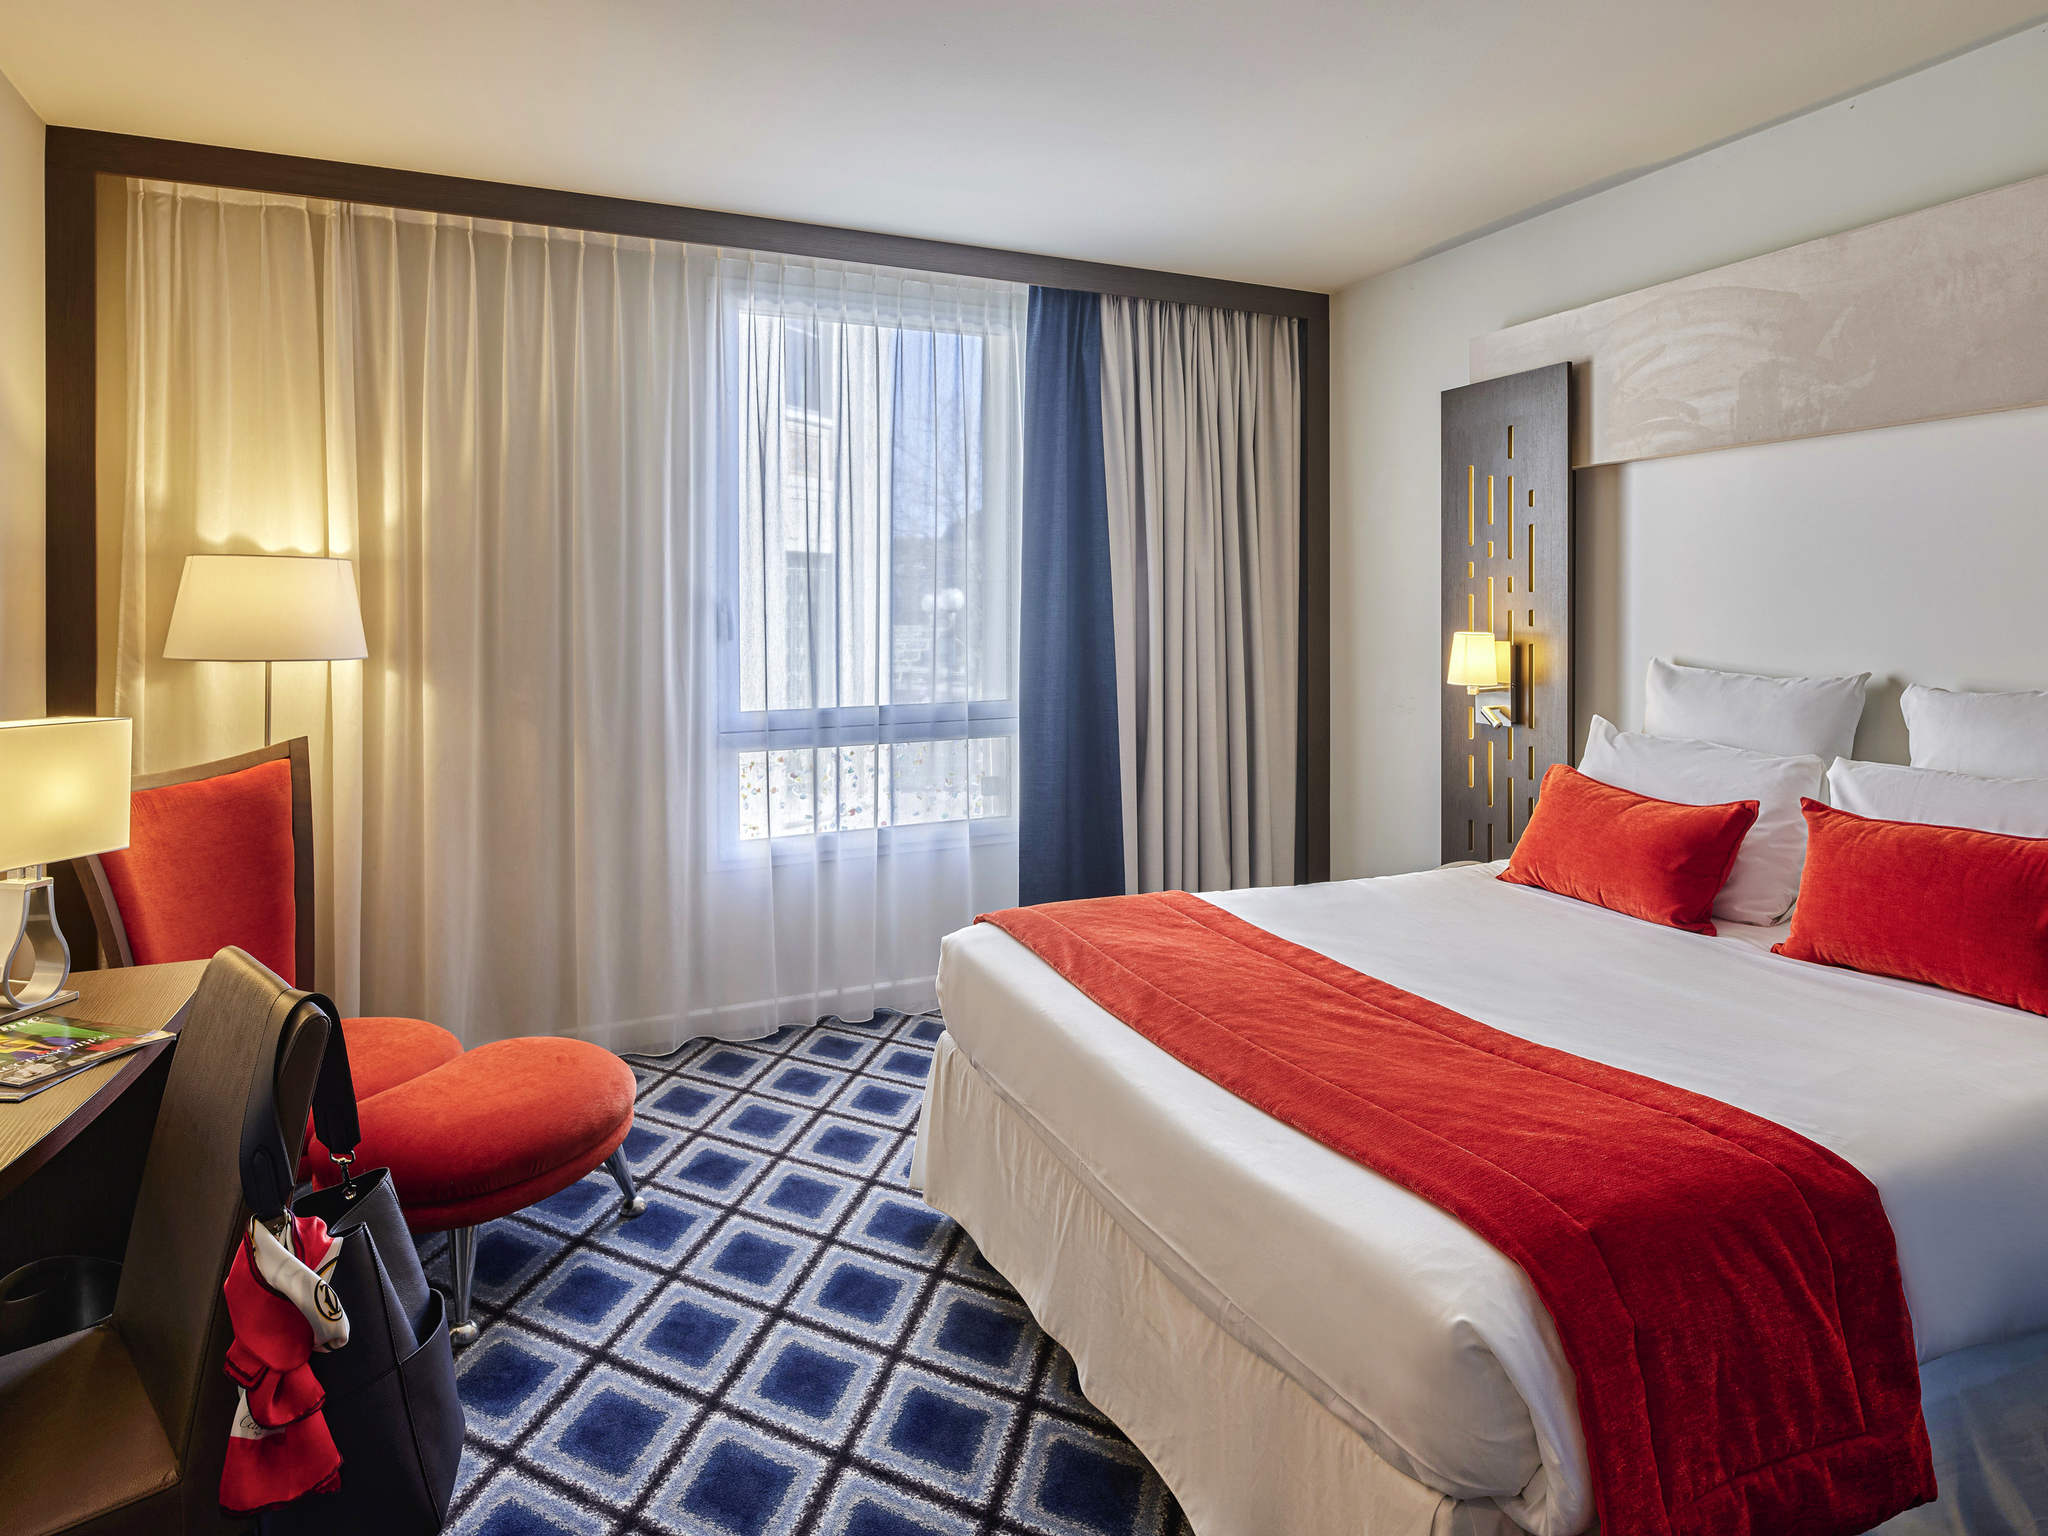 Hotel - Mercure Chartres Centre Cathédrale Hotel